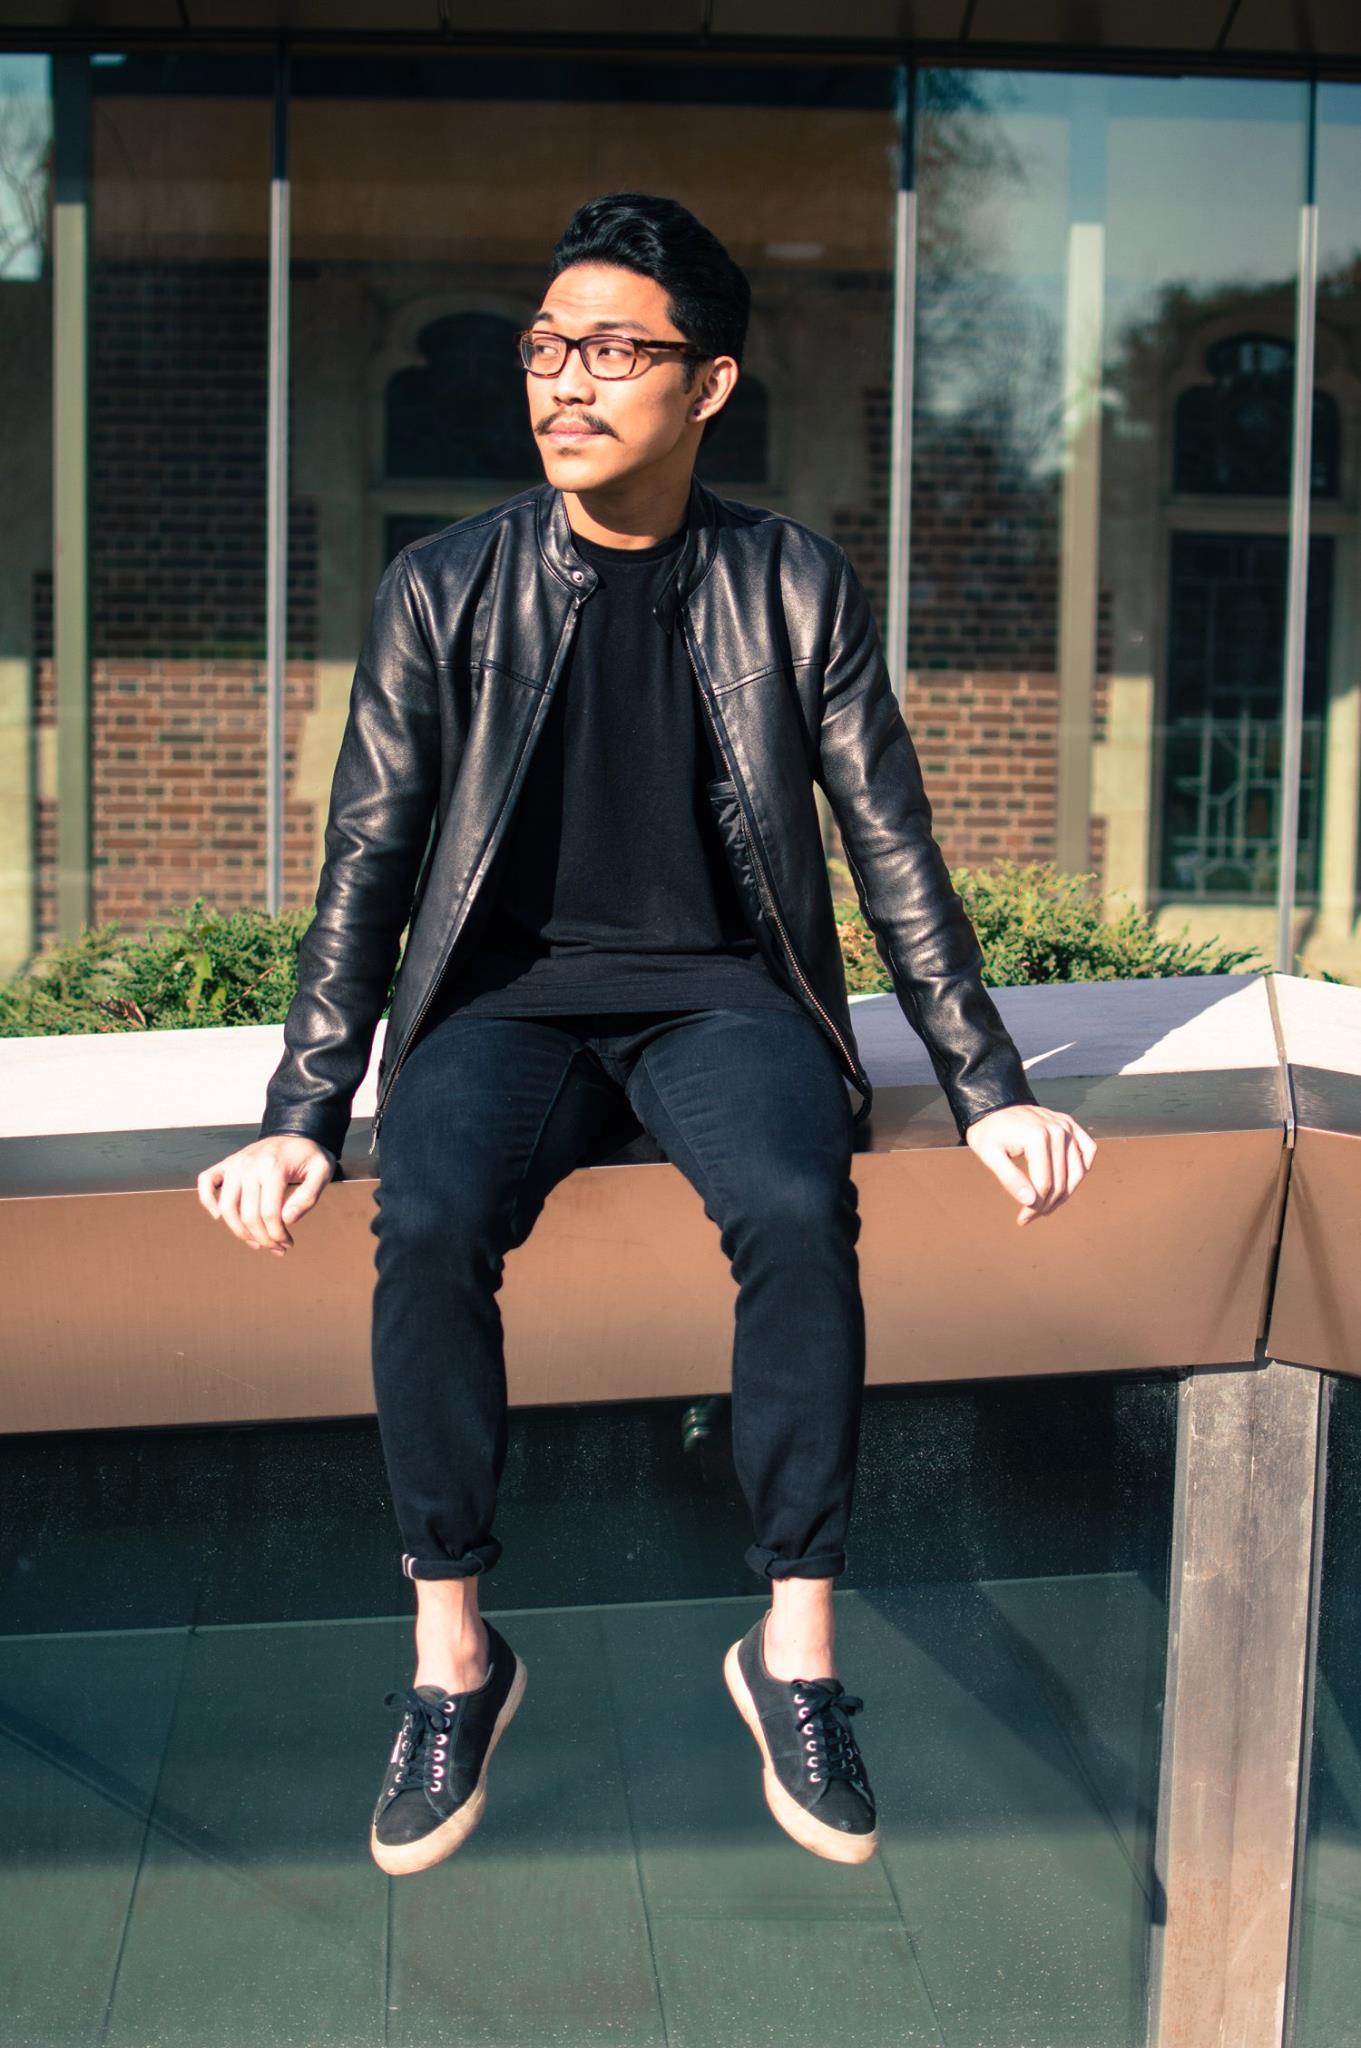 Wearing: New Look longline tee, Banana Republic leather jacket,Uniqlo jeans, Superga sneakers